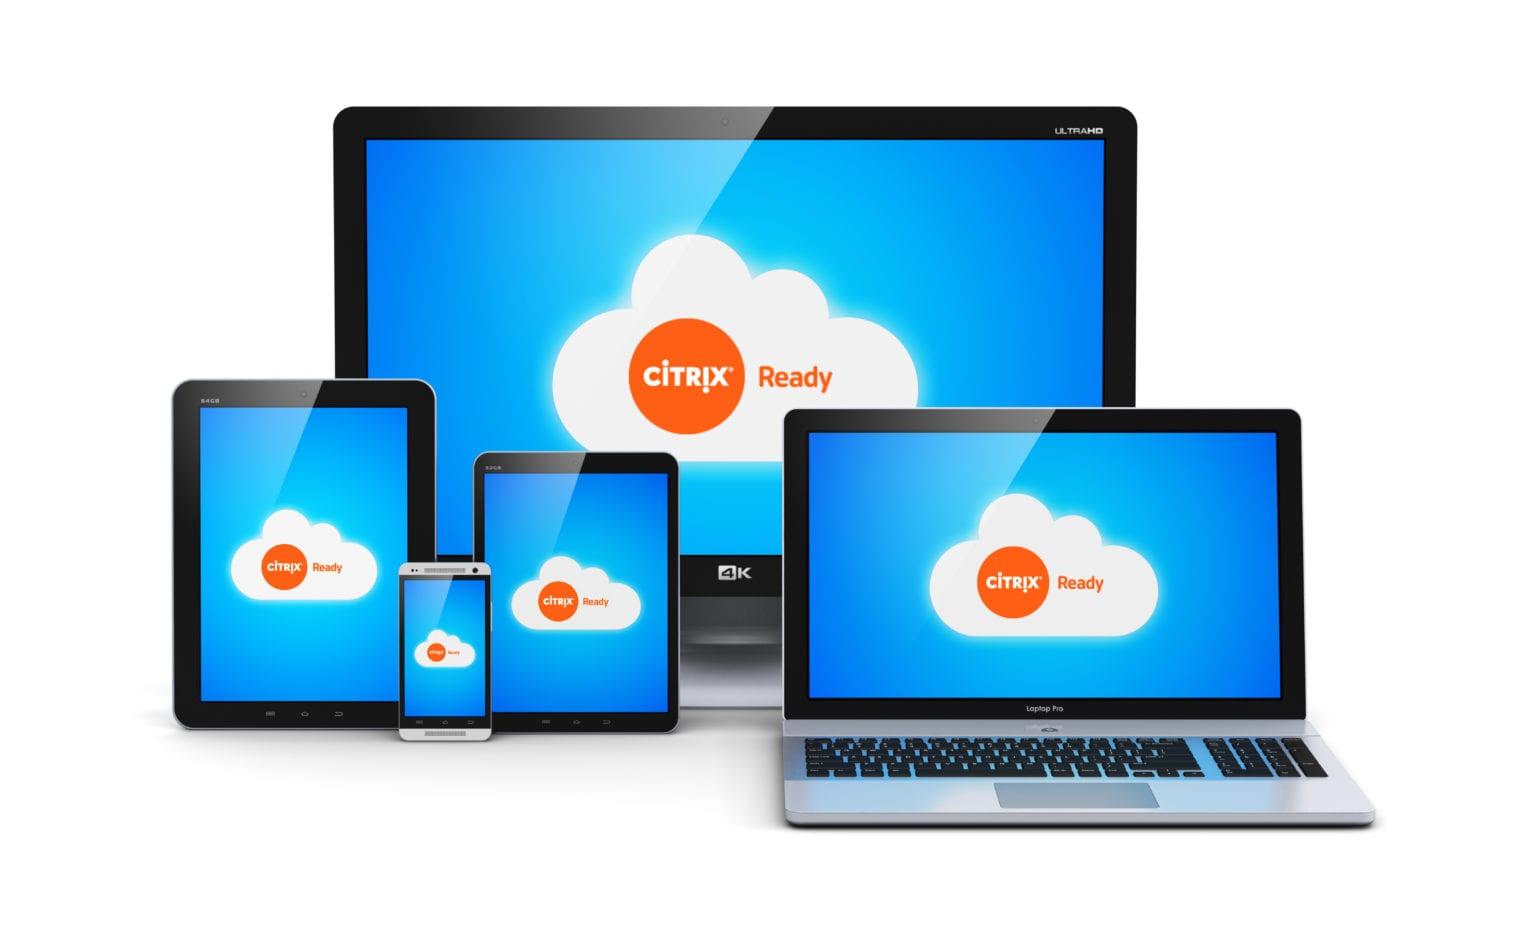 SSI's MySecureCloud Achieves Citrix Ready® IaaS Cloud Status